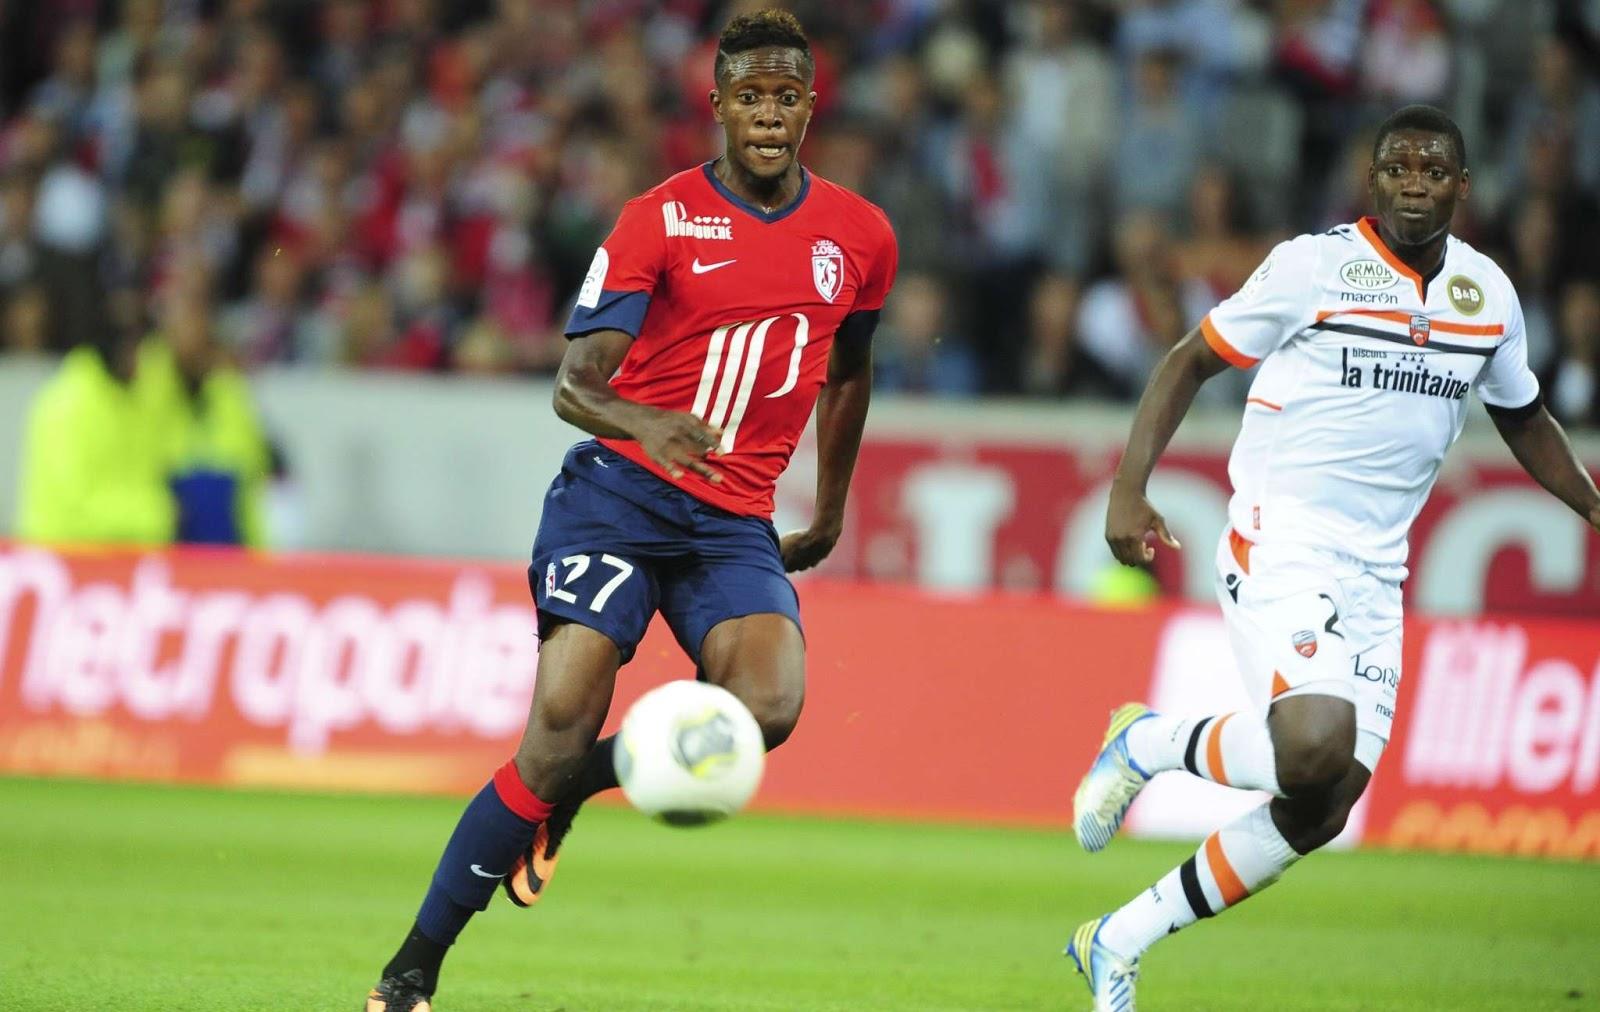 Lille vs Lorient là trận tranh tài hấp dẫn tại vòng 11 Ligue 1